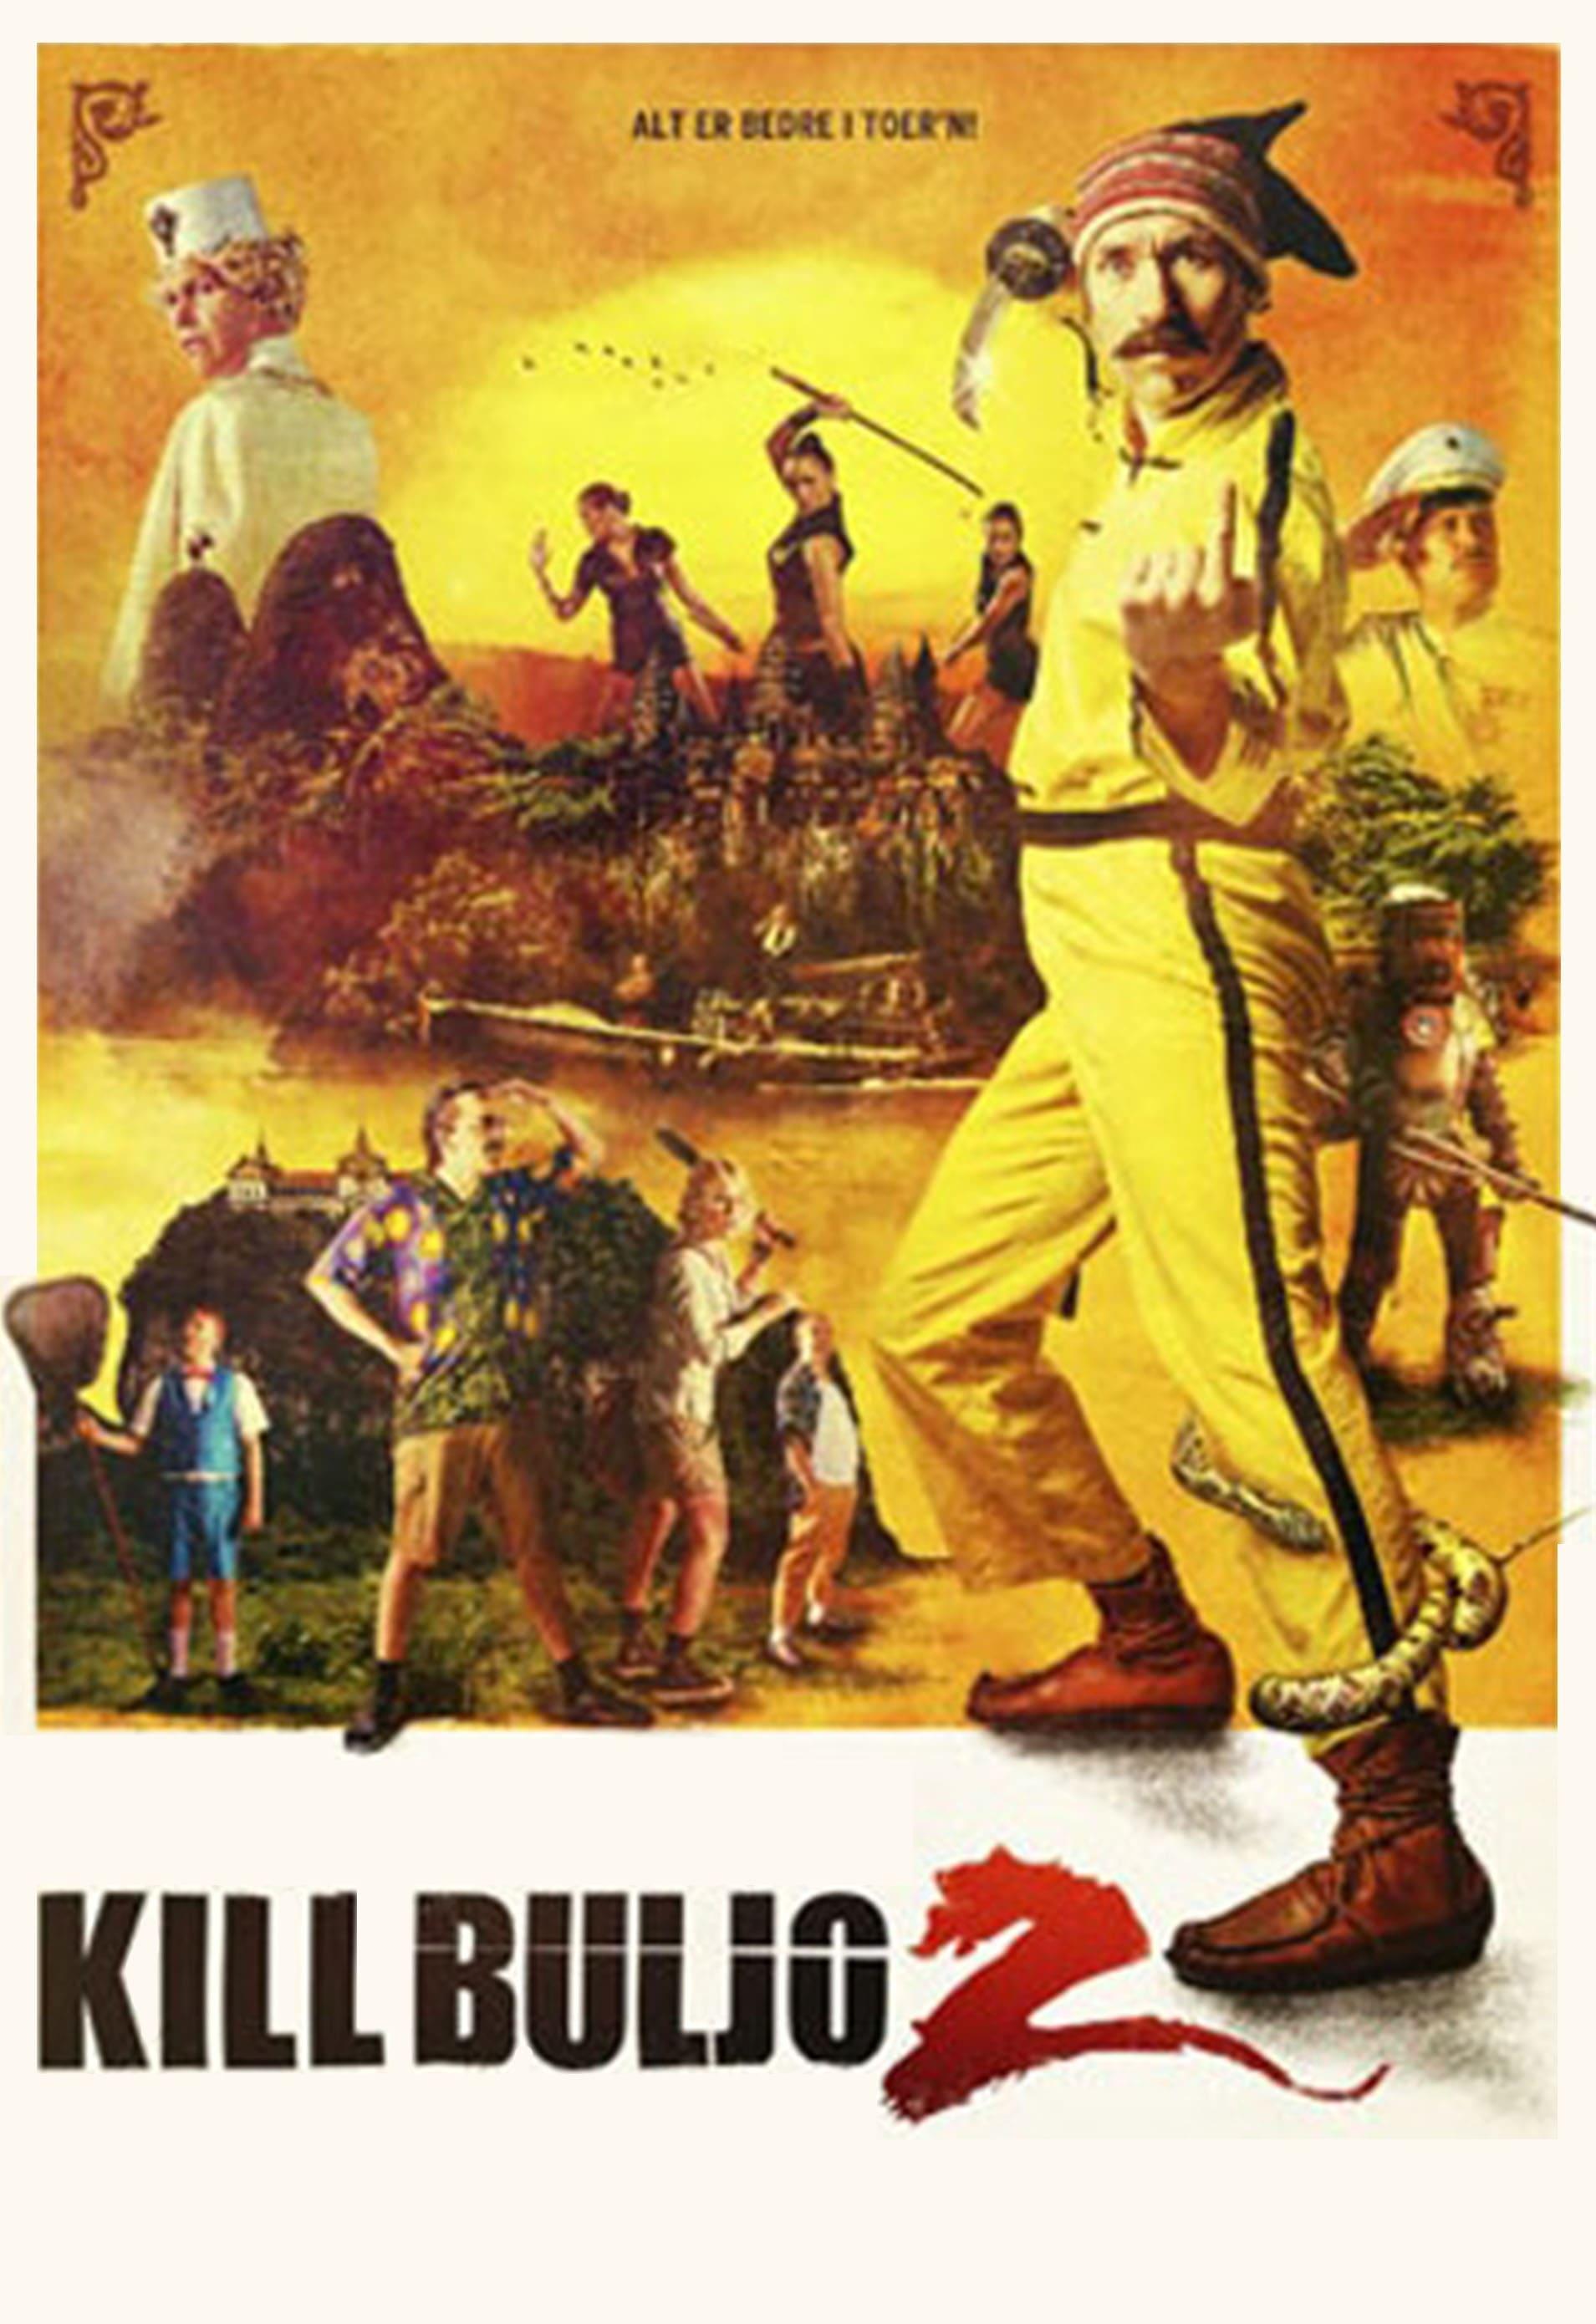 kill buljo 2 full movie online free